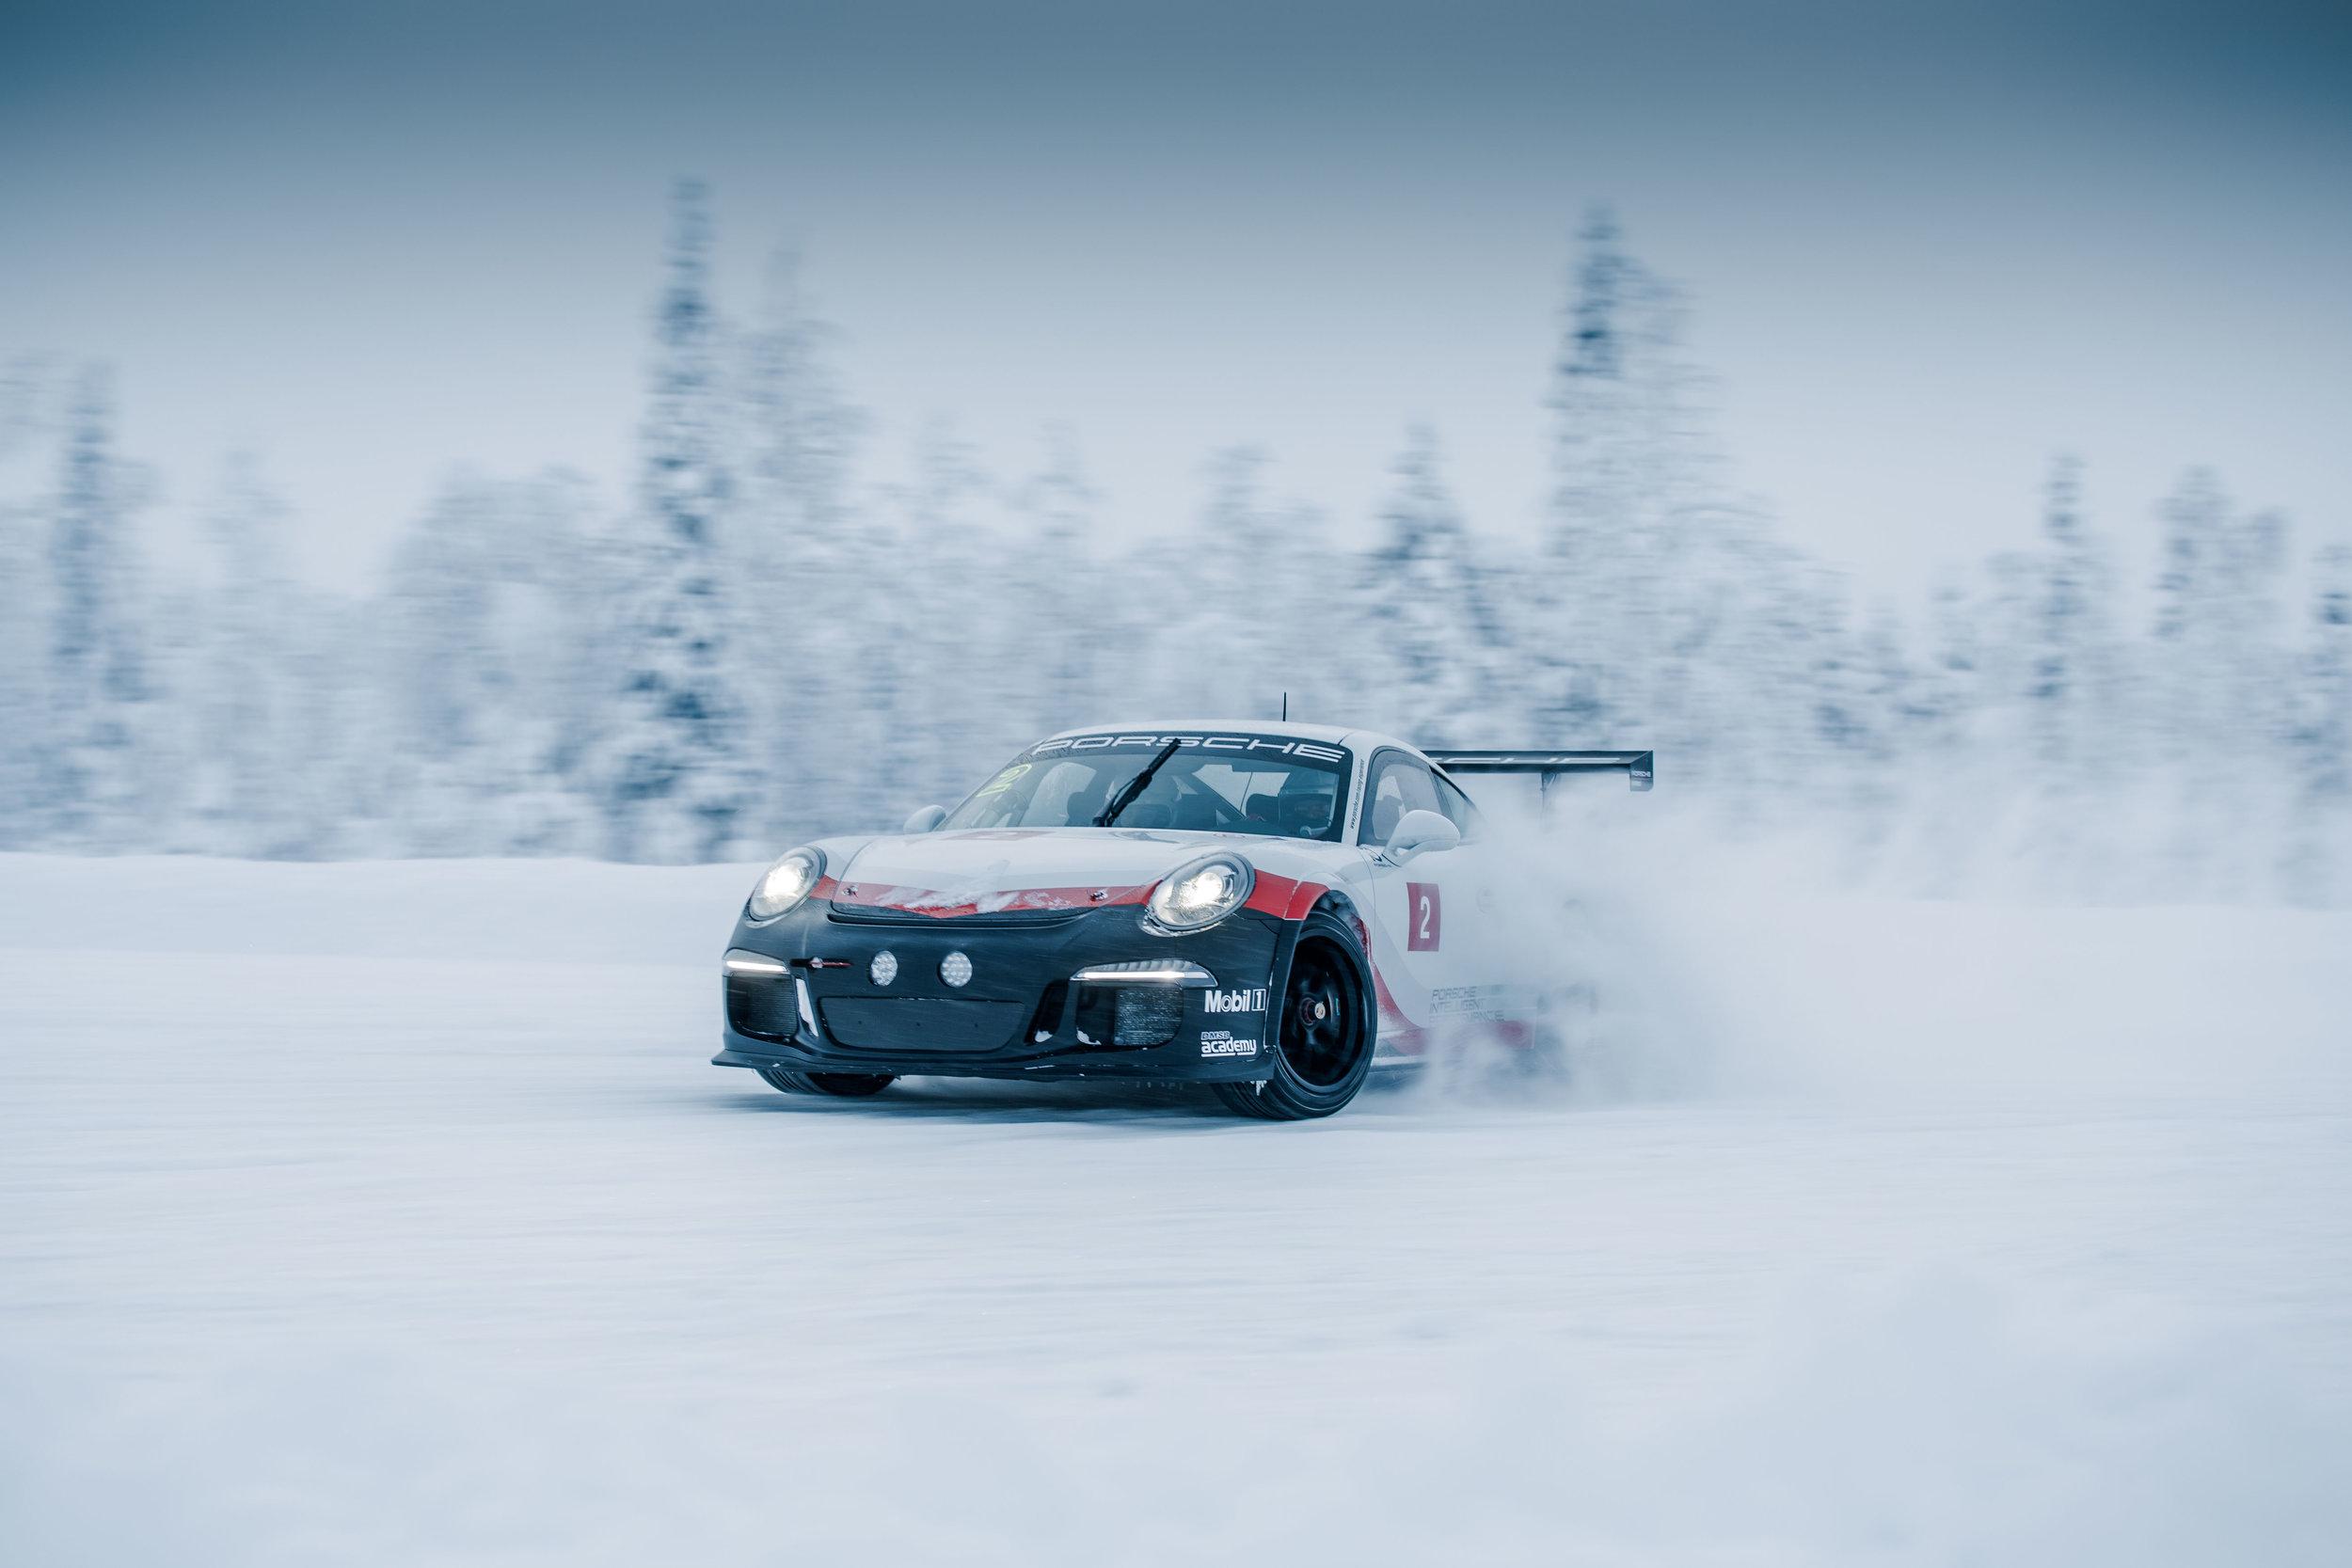 Porsche Ice Experience on Ice_30_01_2019_0432_175678.jpg